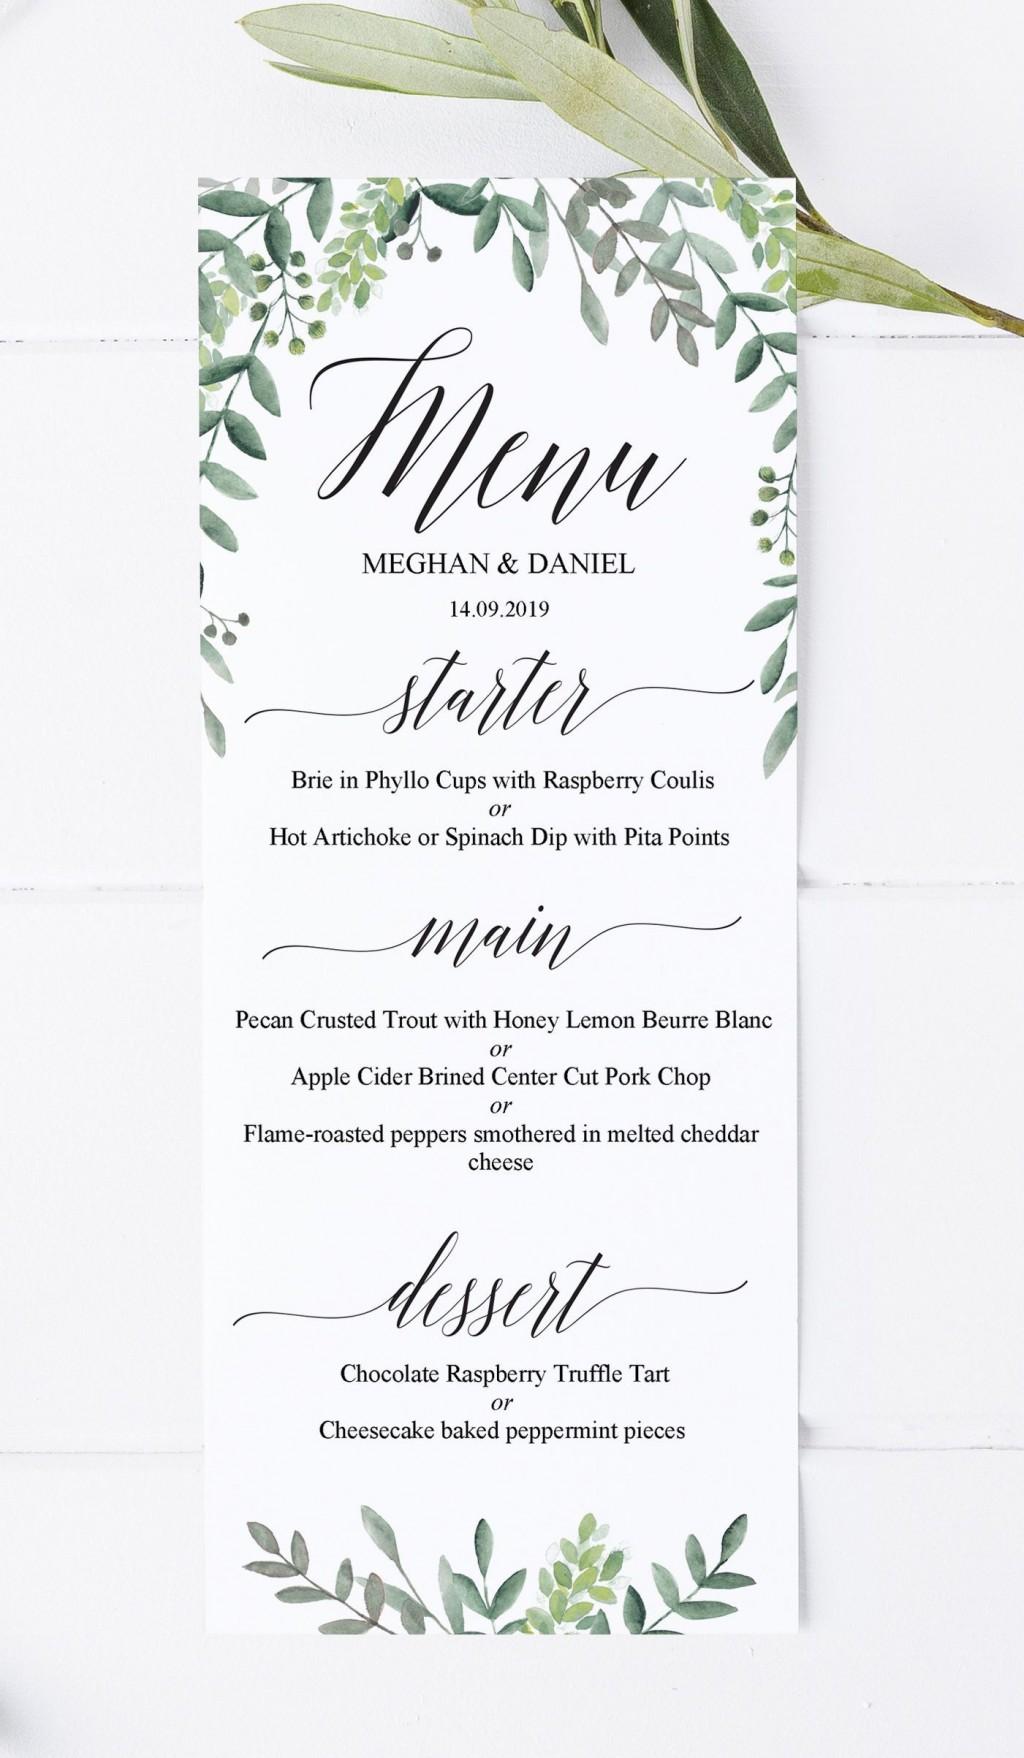 000 Marvelou Diy Wedding Menu Template Sample  Free CardLarge